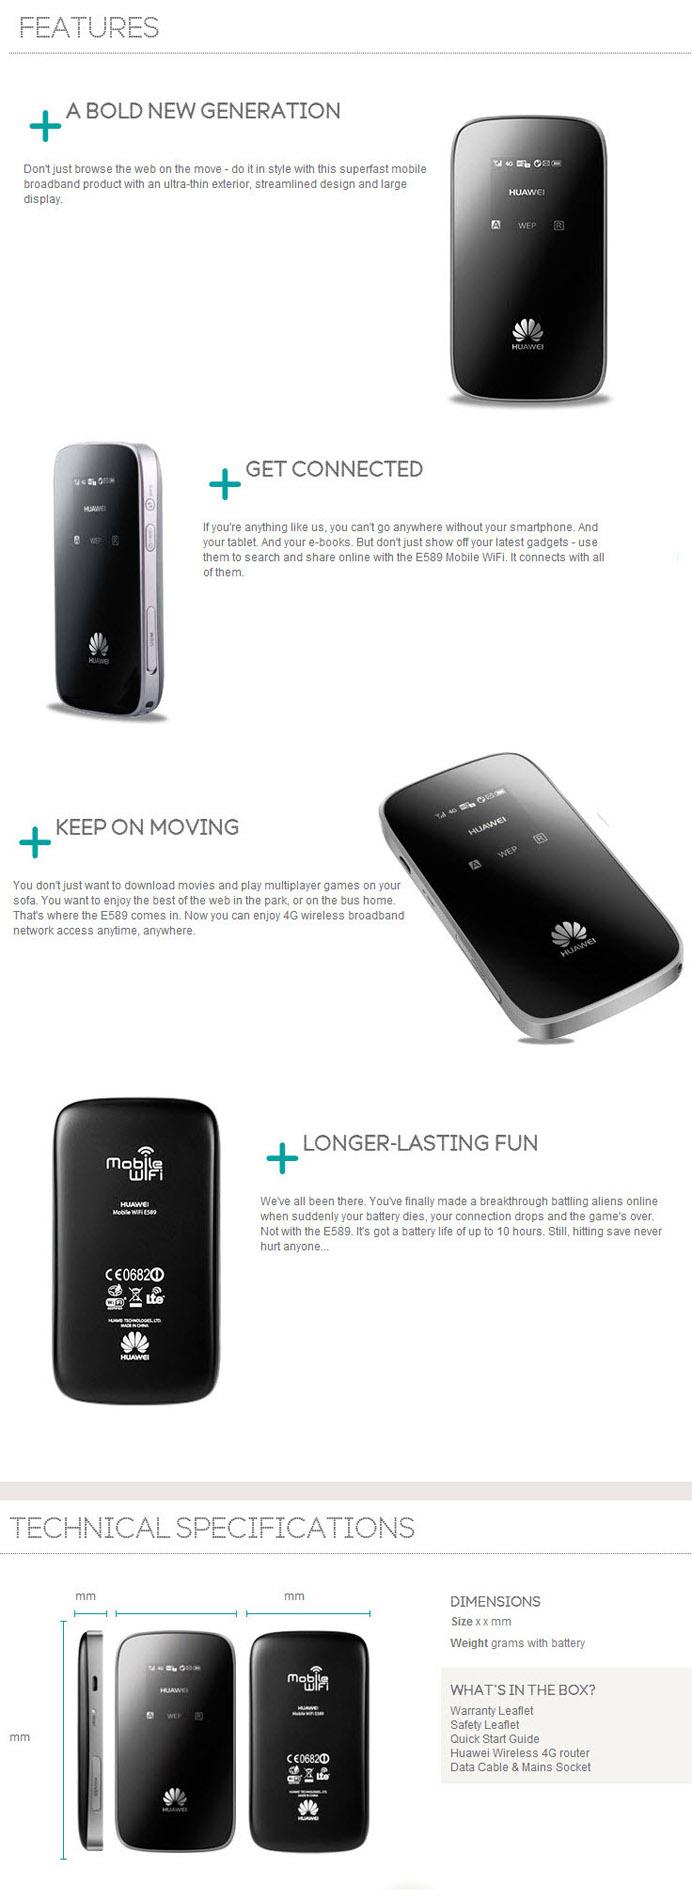 HUAWEI E589 4G LTE Pocket WIFI HOTSPOT